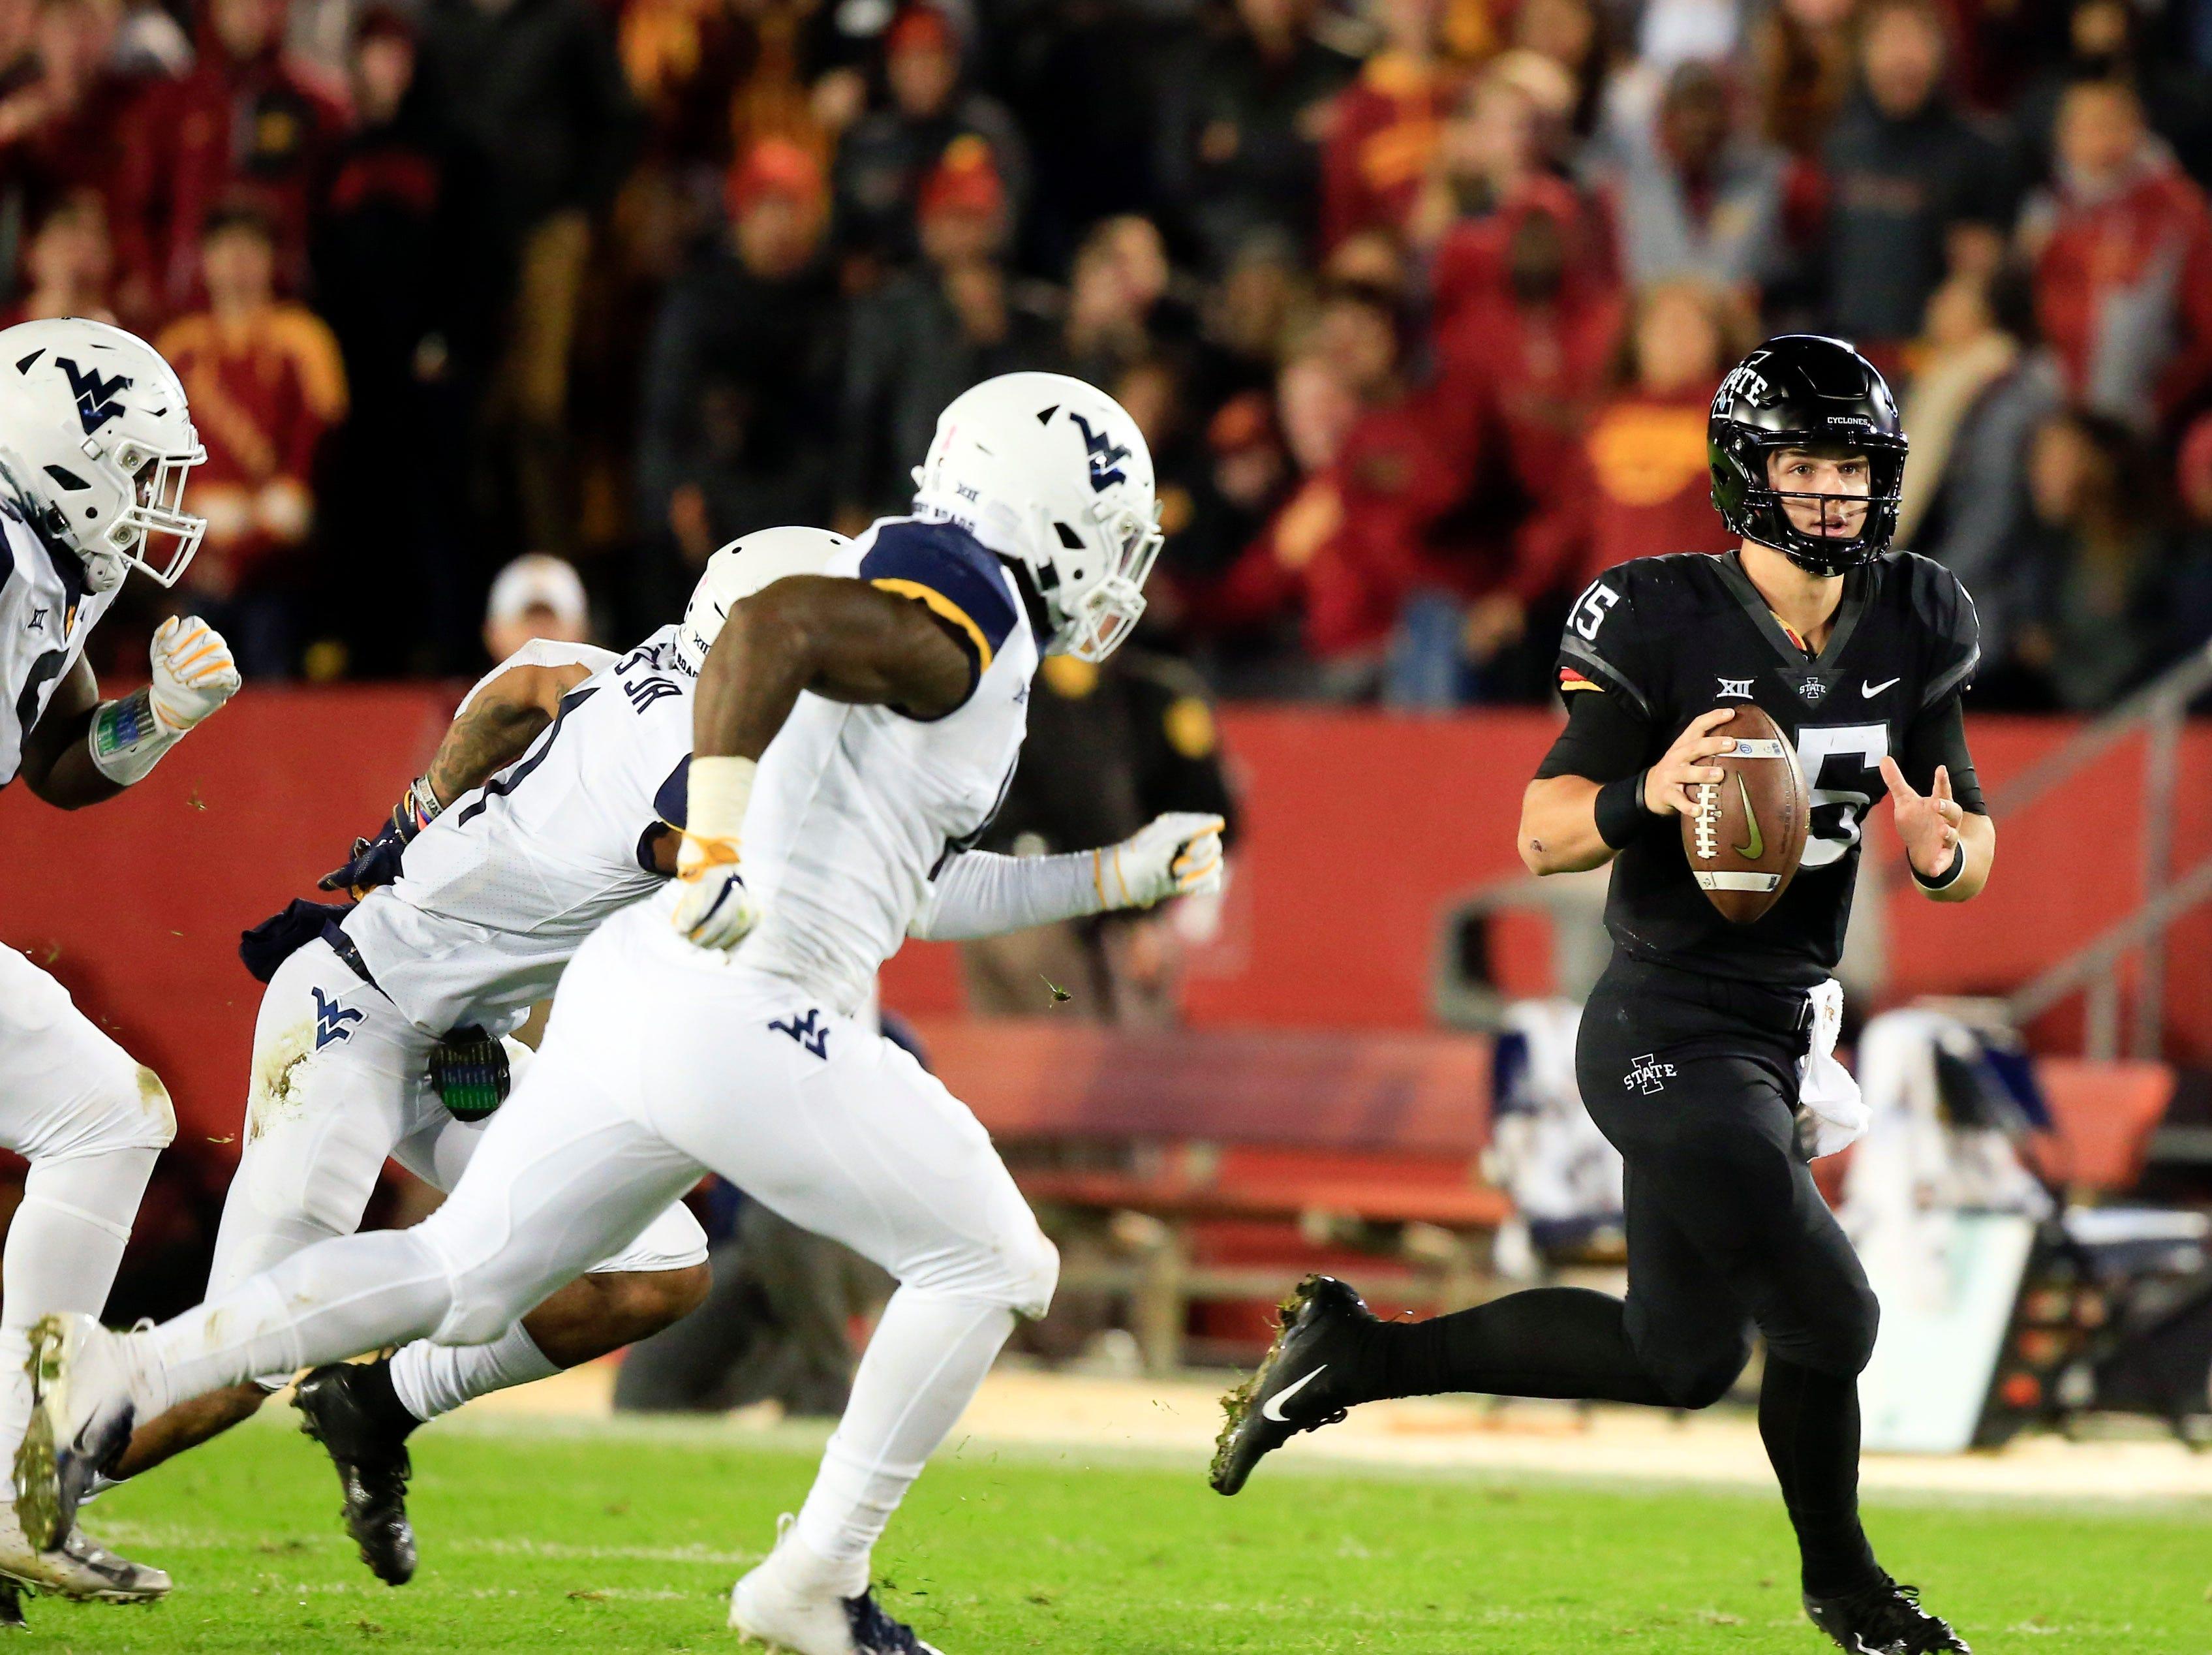 Iowa State quarterback Brock Purdy looks to pass during the Iowa State-West Virginia game at Jack Trice Stadium Saturday, Oct. 13, 2018.